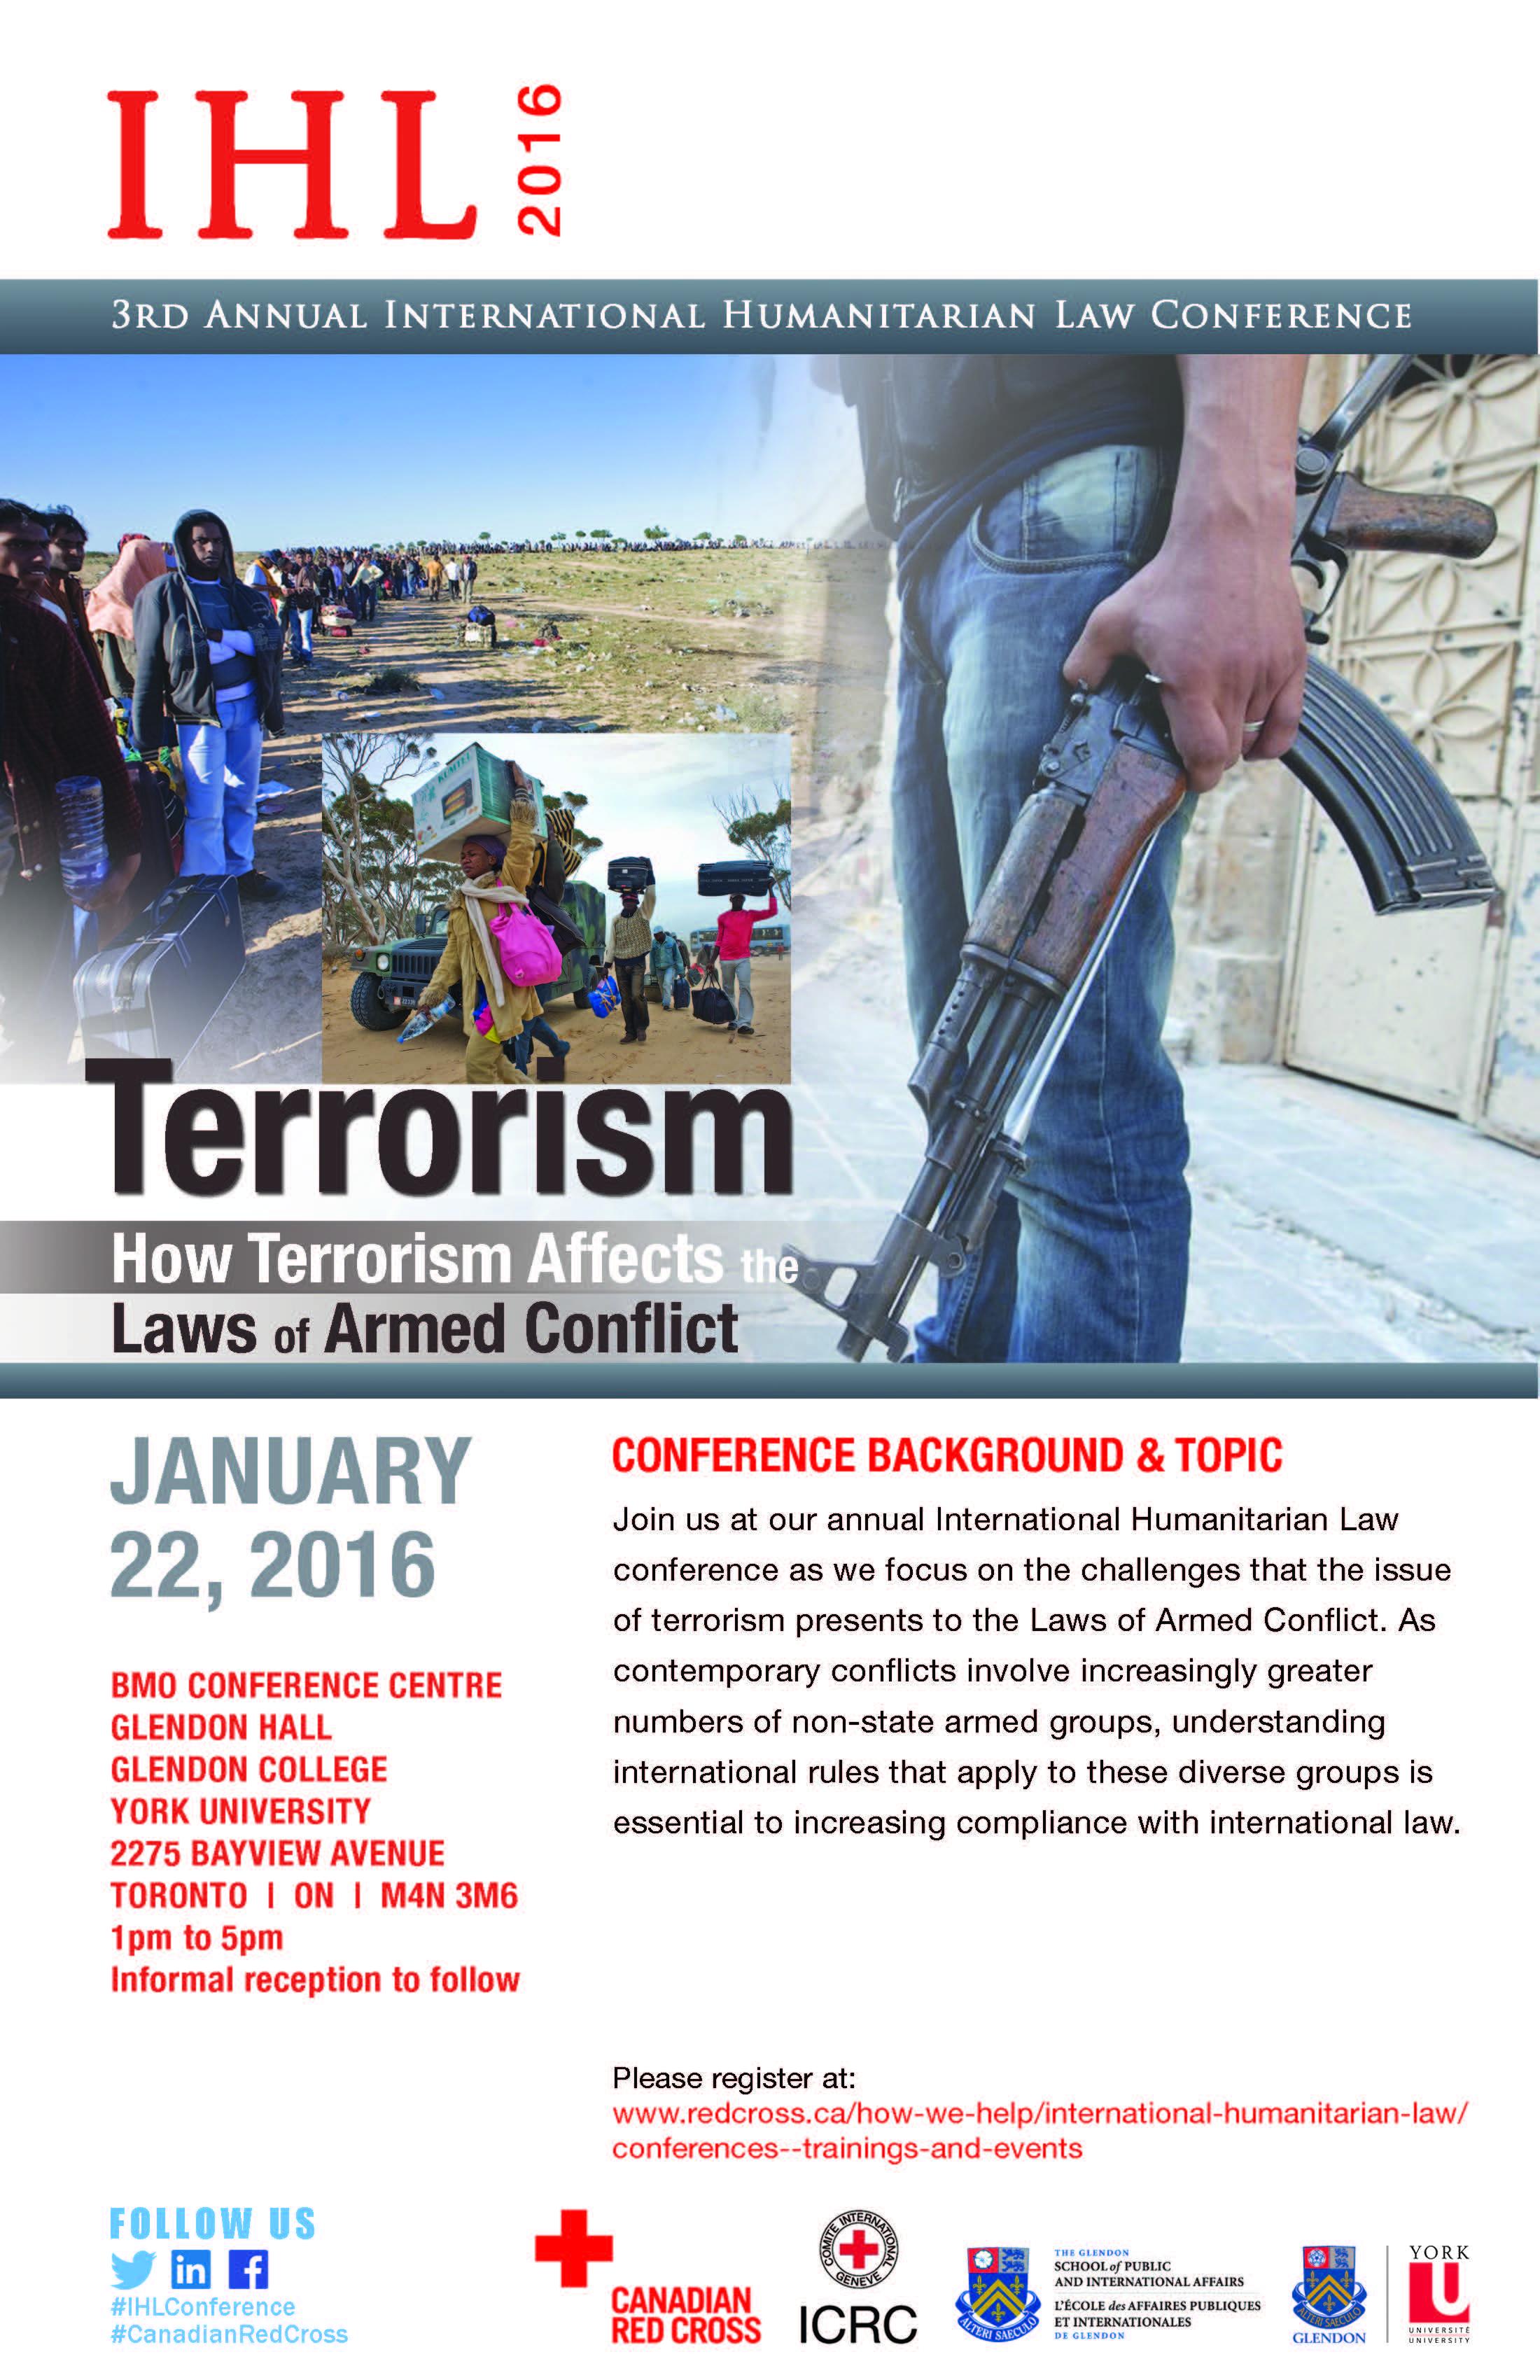 3rd Annual International Humanitarian Law Conference - Terrorism @ BMO Conference Centre, Glendon Hall   Toronto   Ontario   Canada